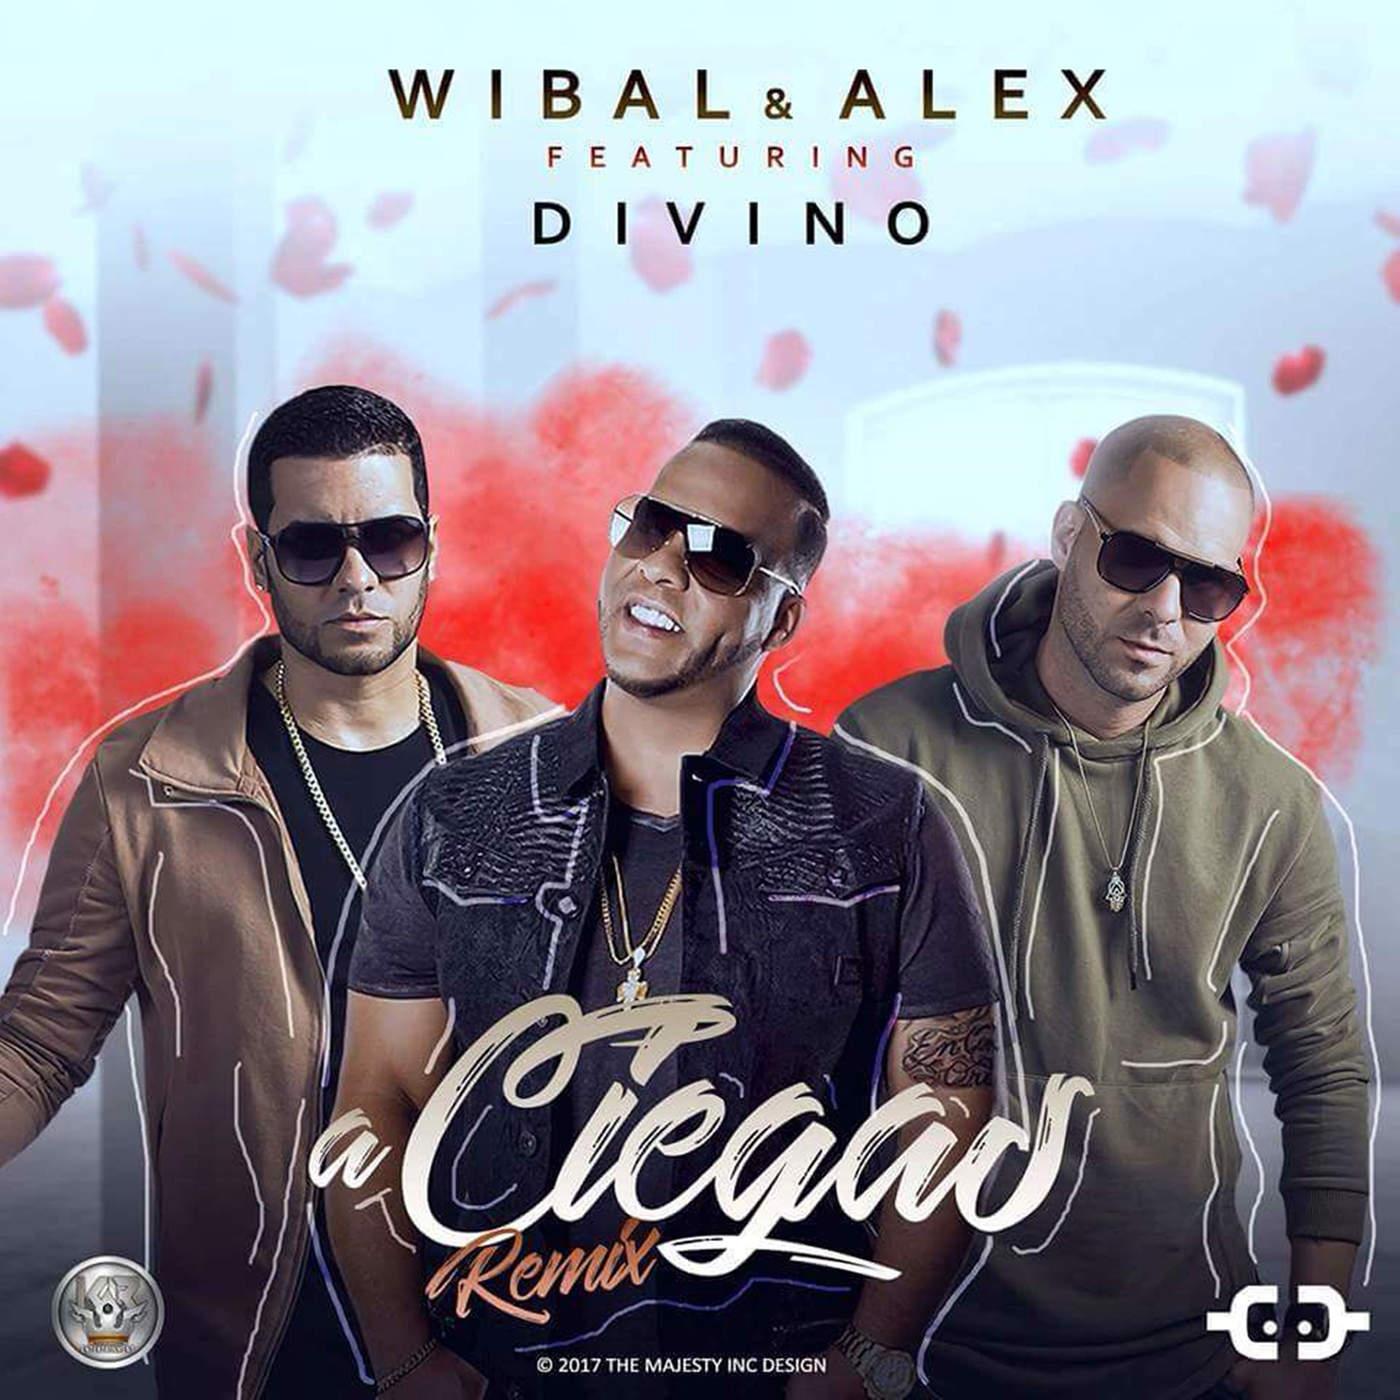 Wibal & Alex - A Ciegas (Remix) [feat. Divino] - Single